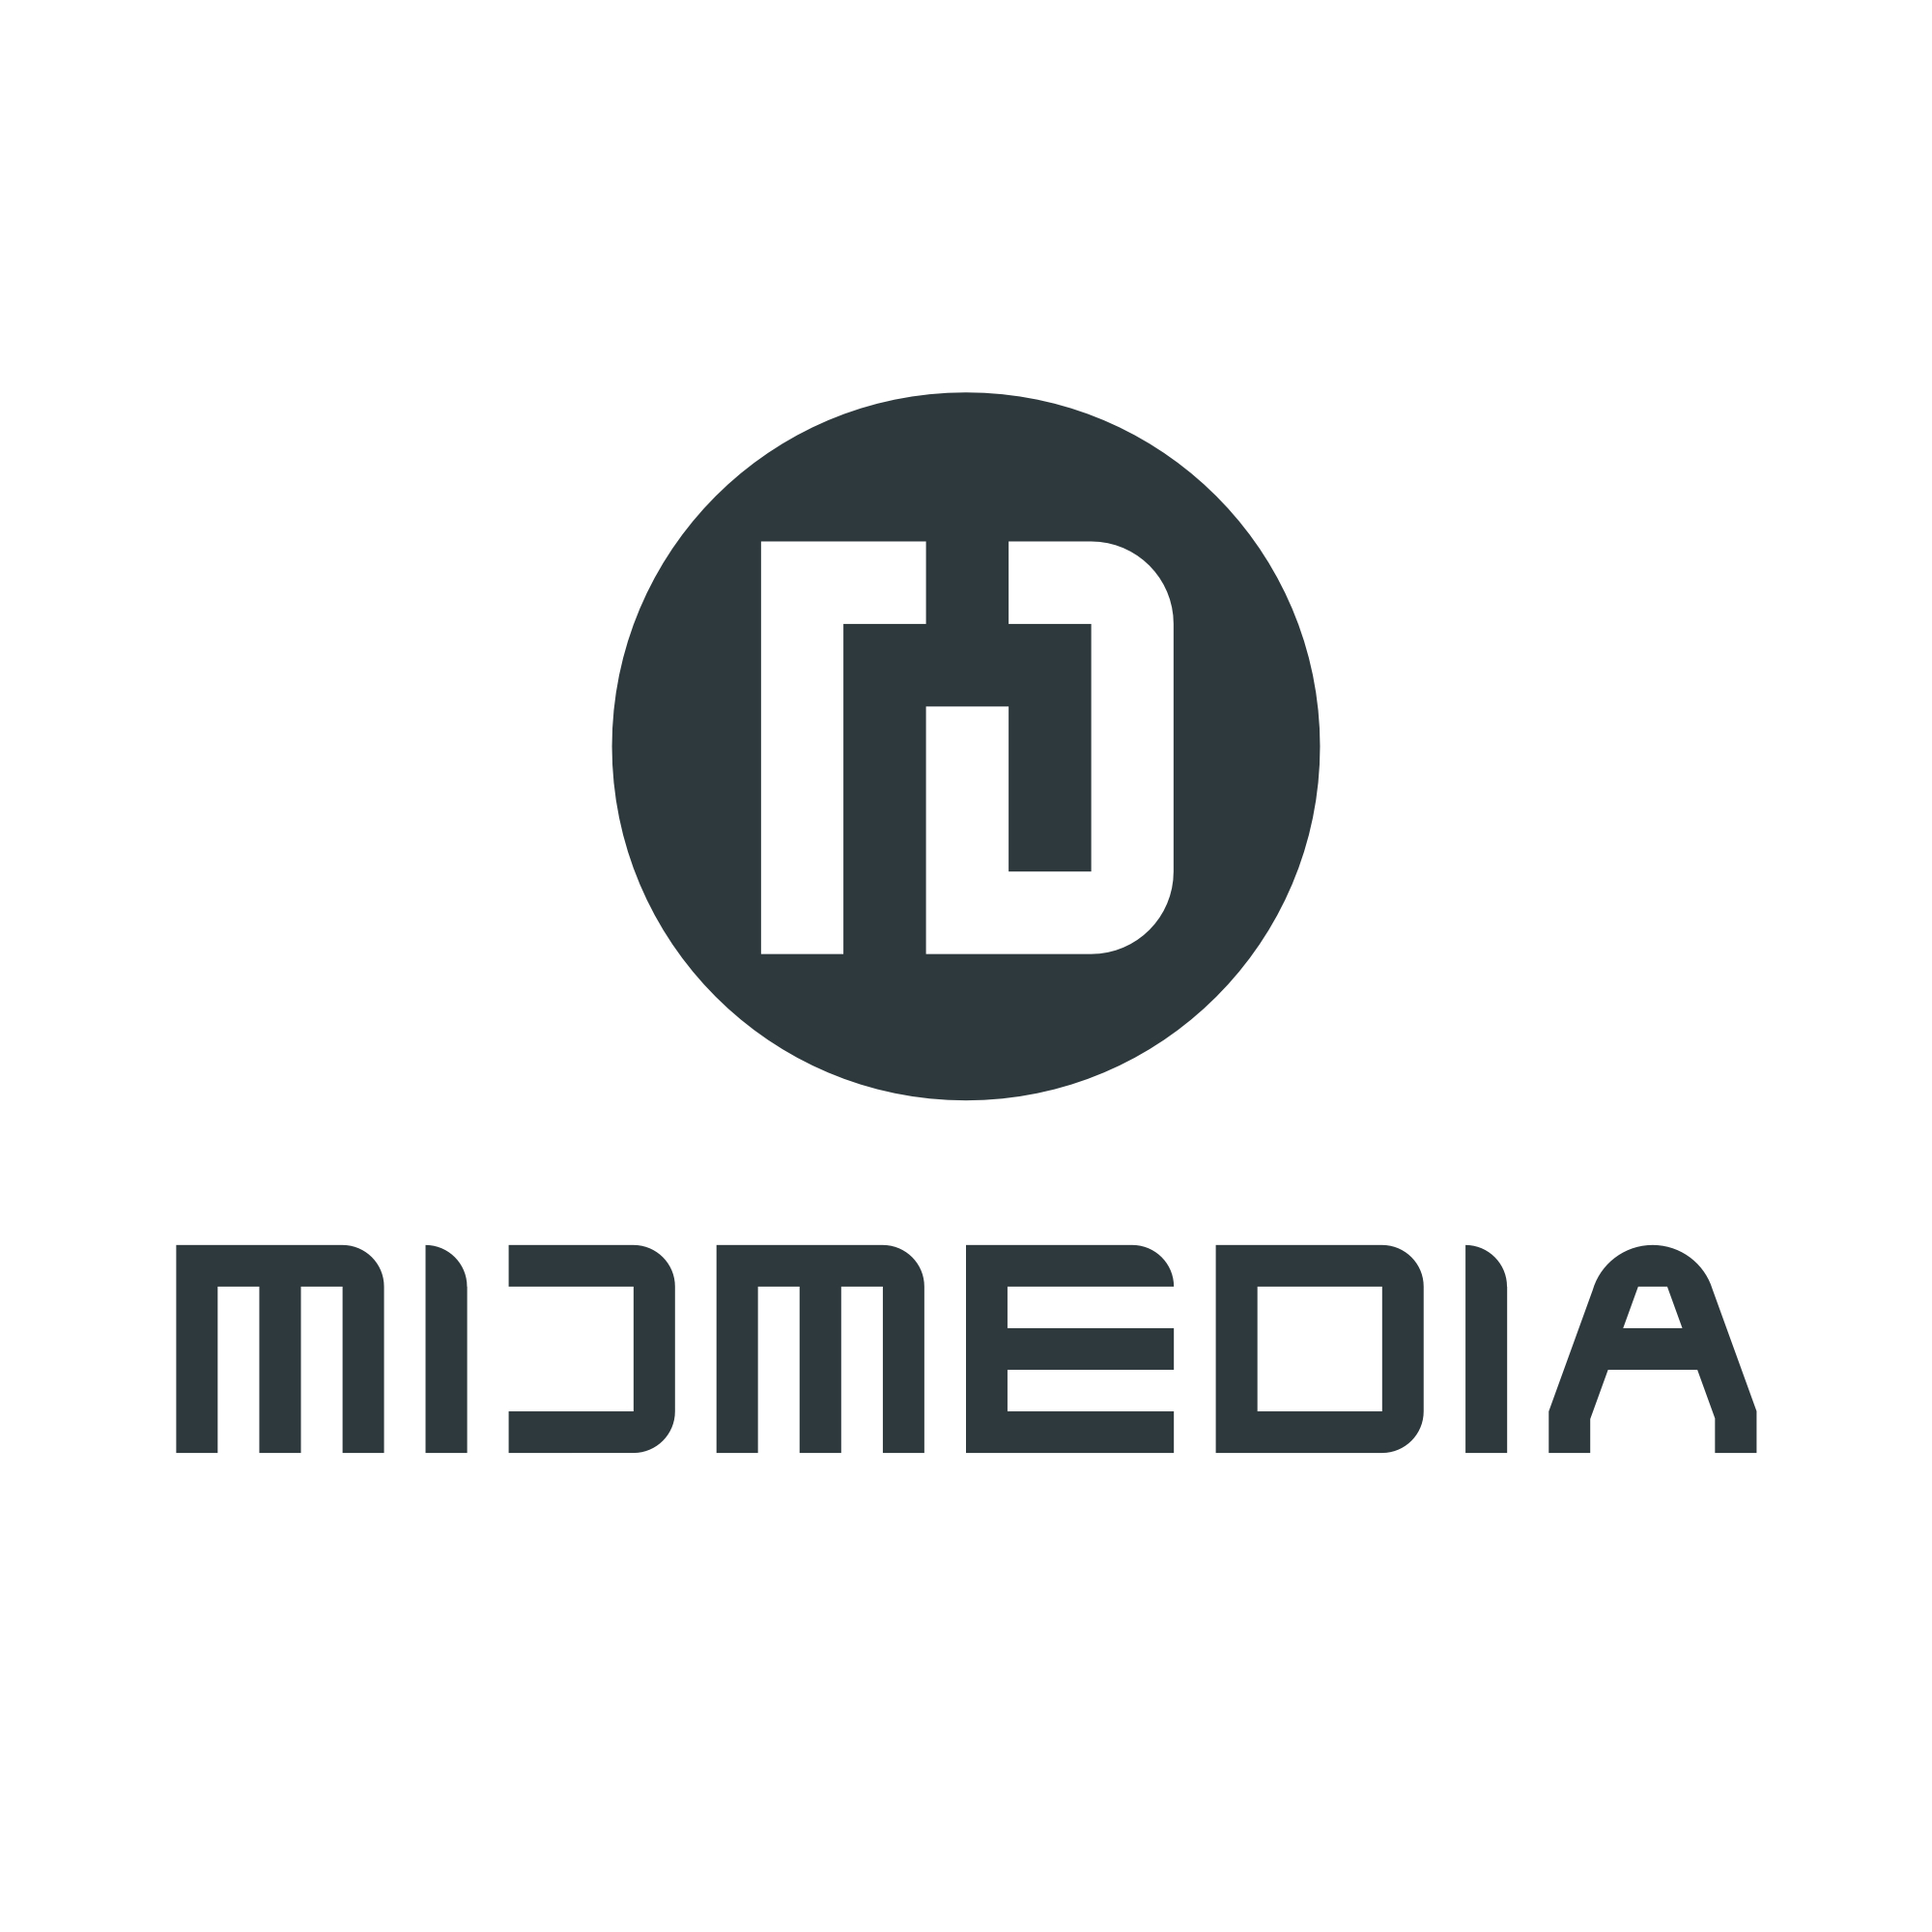 MICMEDIA Logo Werbung & Kommunikation